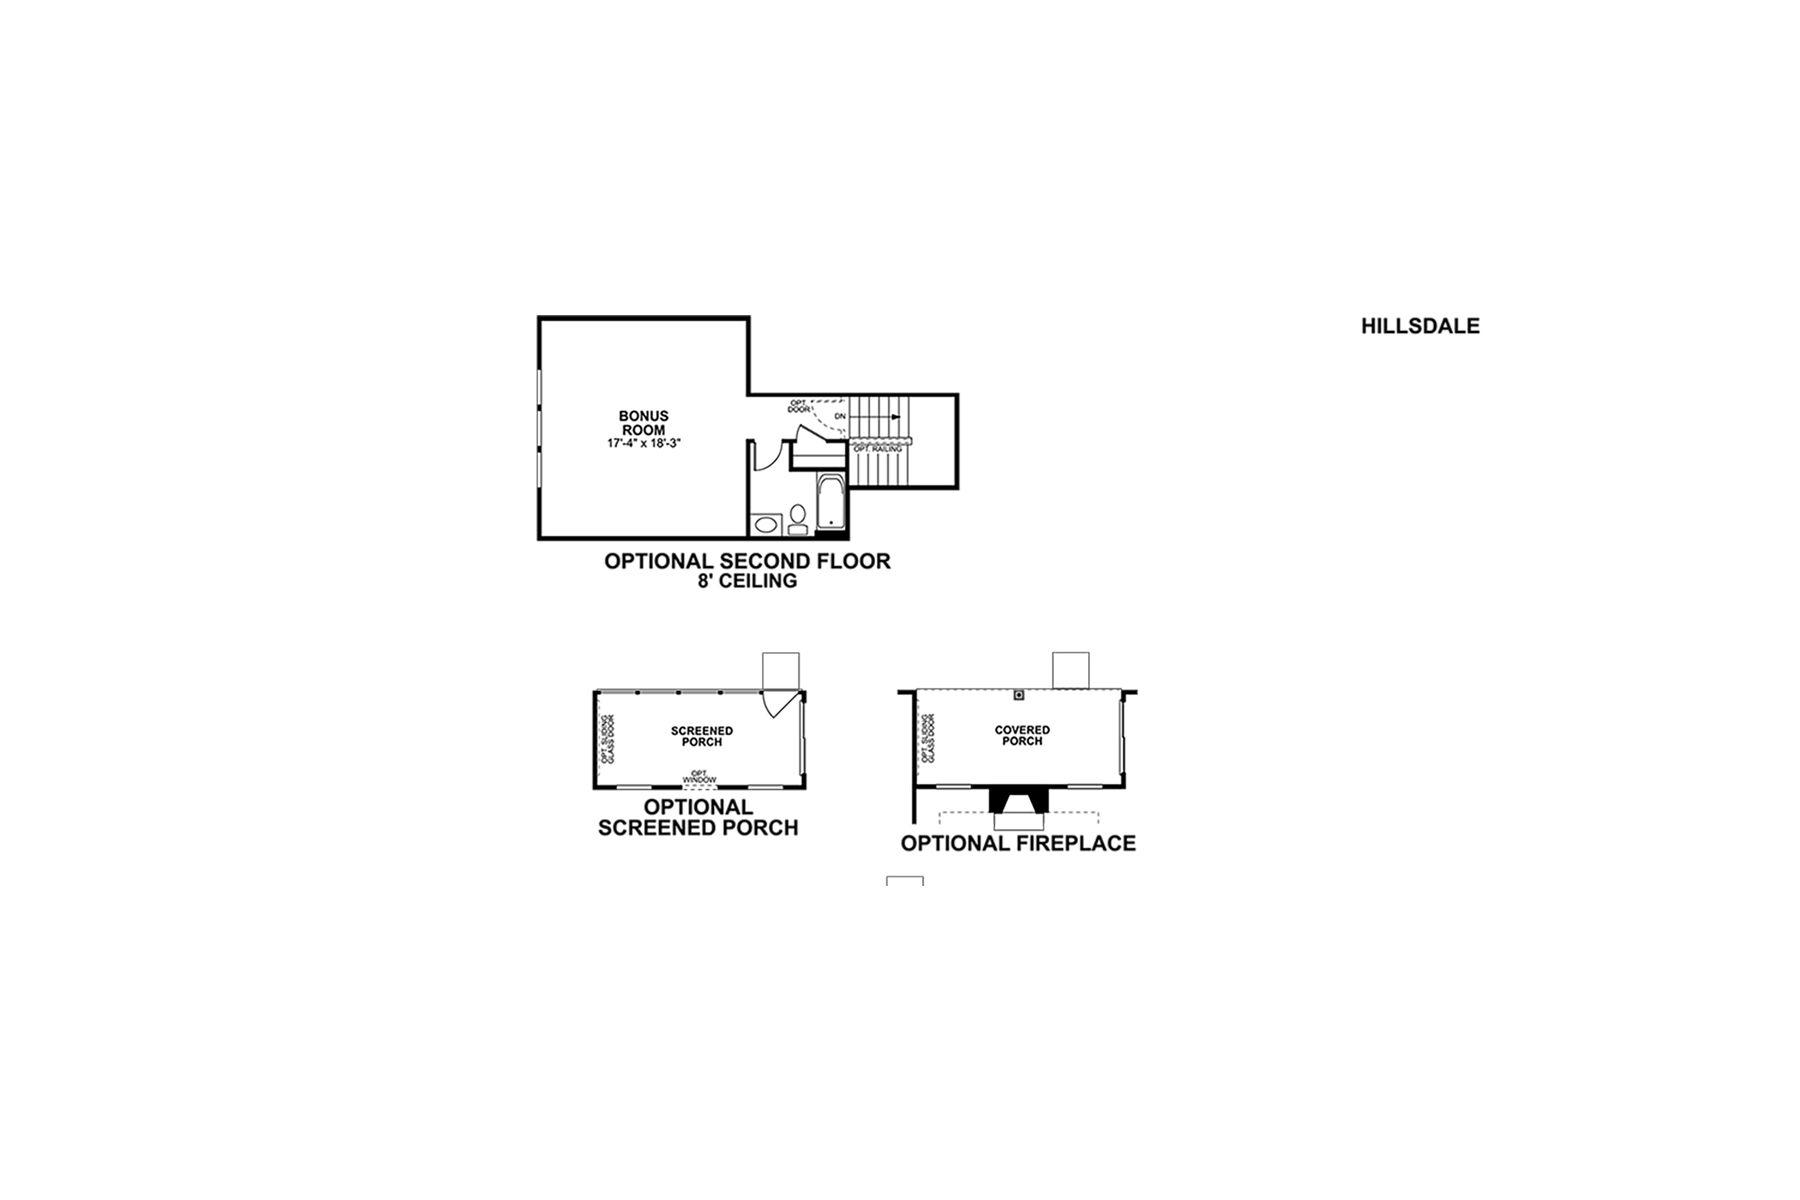 Hillsdale Floorplan Options